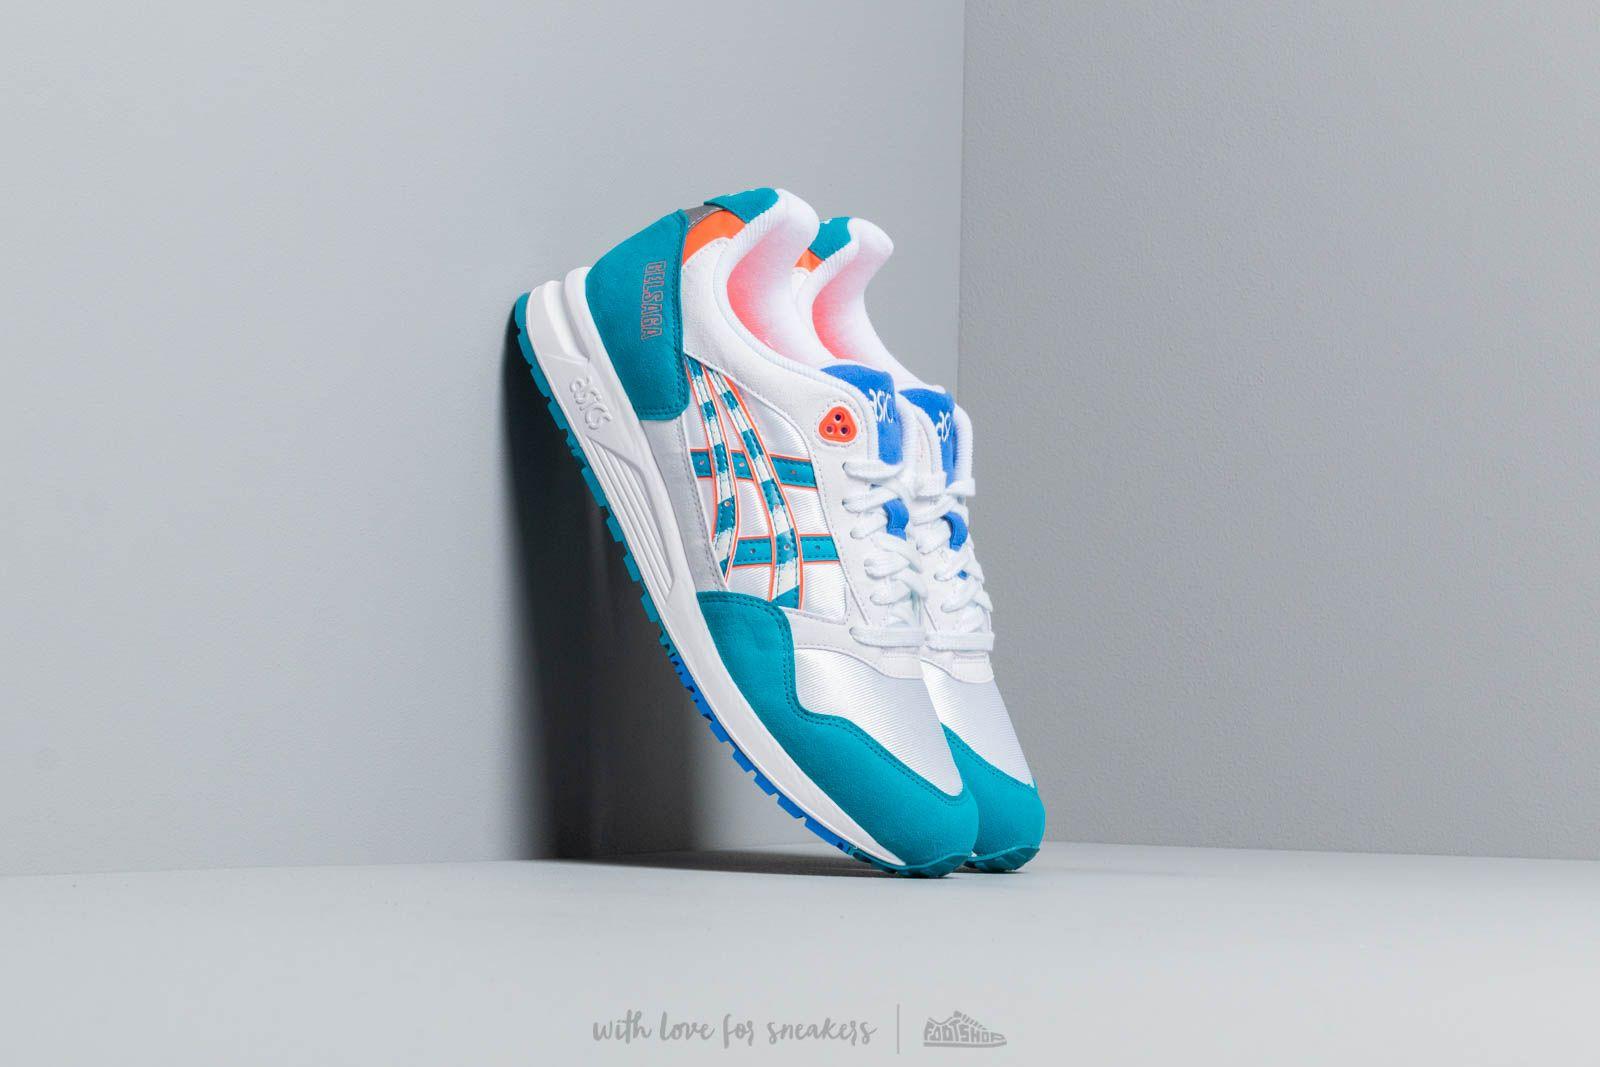 Pánské tenisky a boty Asics Gelsaga White/ Teal Blue